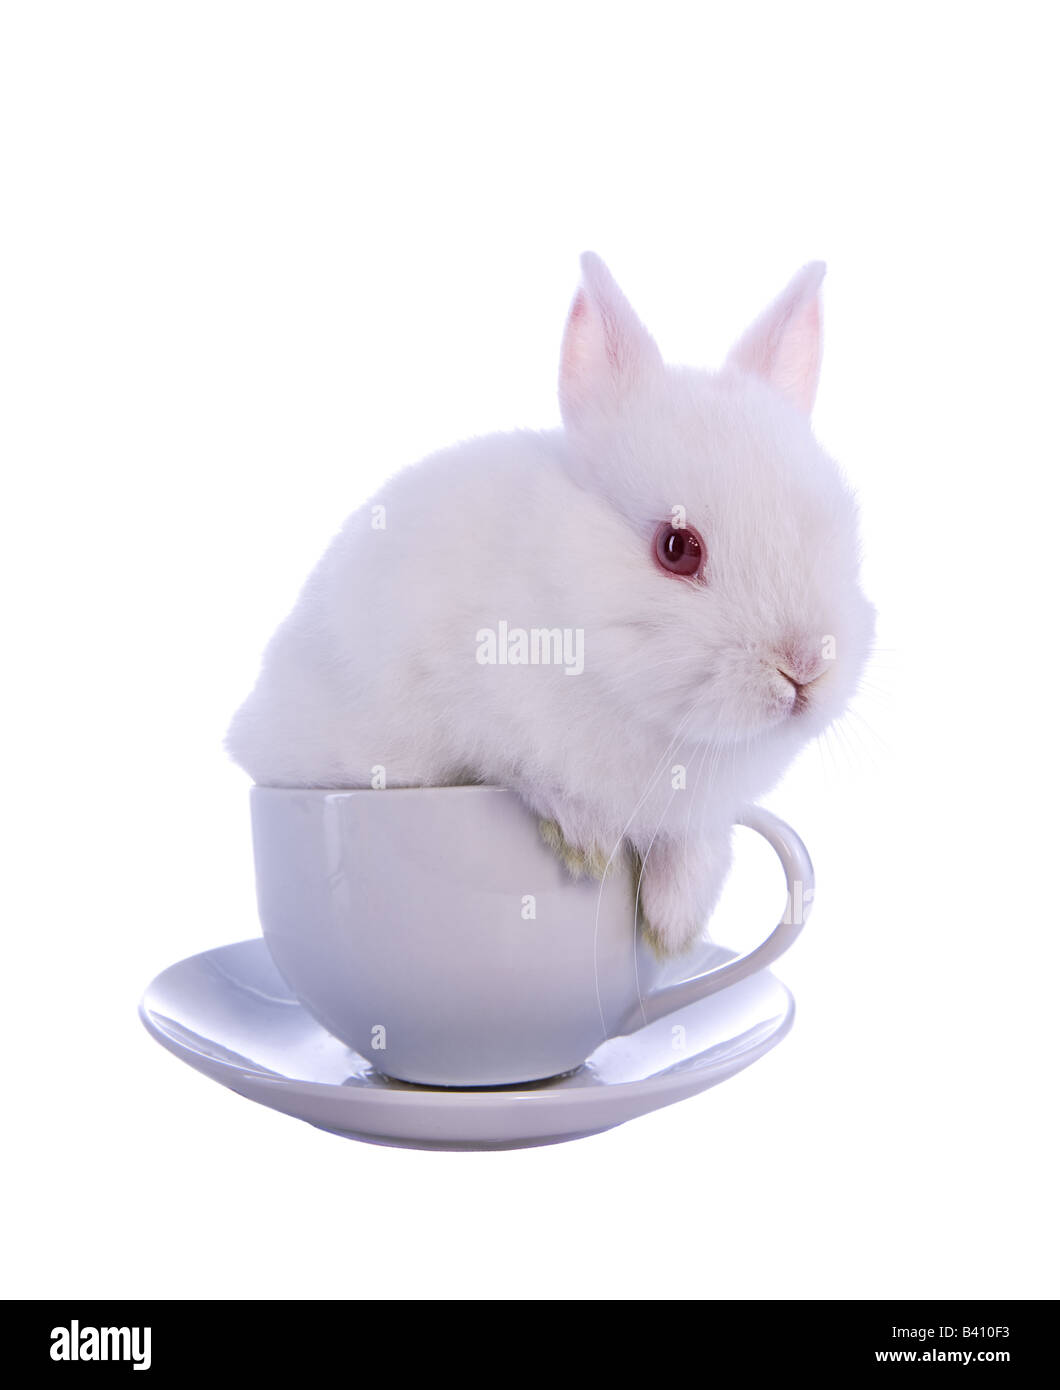 Baby Teacup Bunnies : teacup, bunnies, Netherland, Dwarf, Rabbit, Resolution, Stock, Photography, Images, Alamy